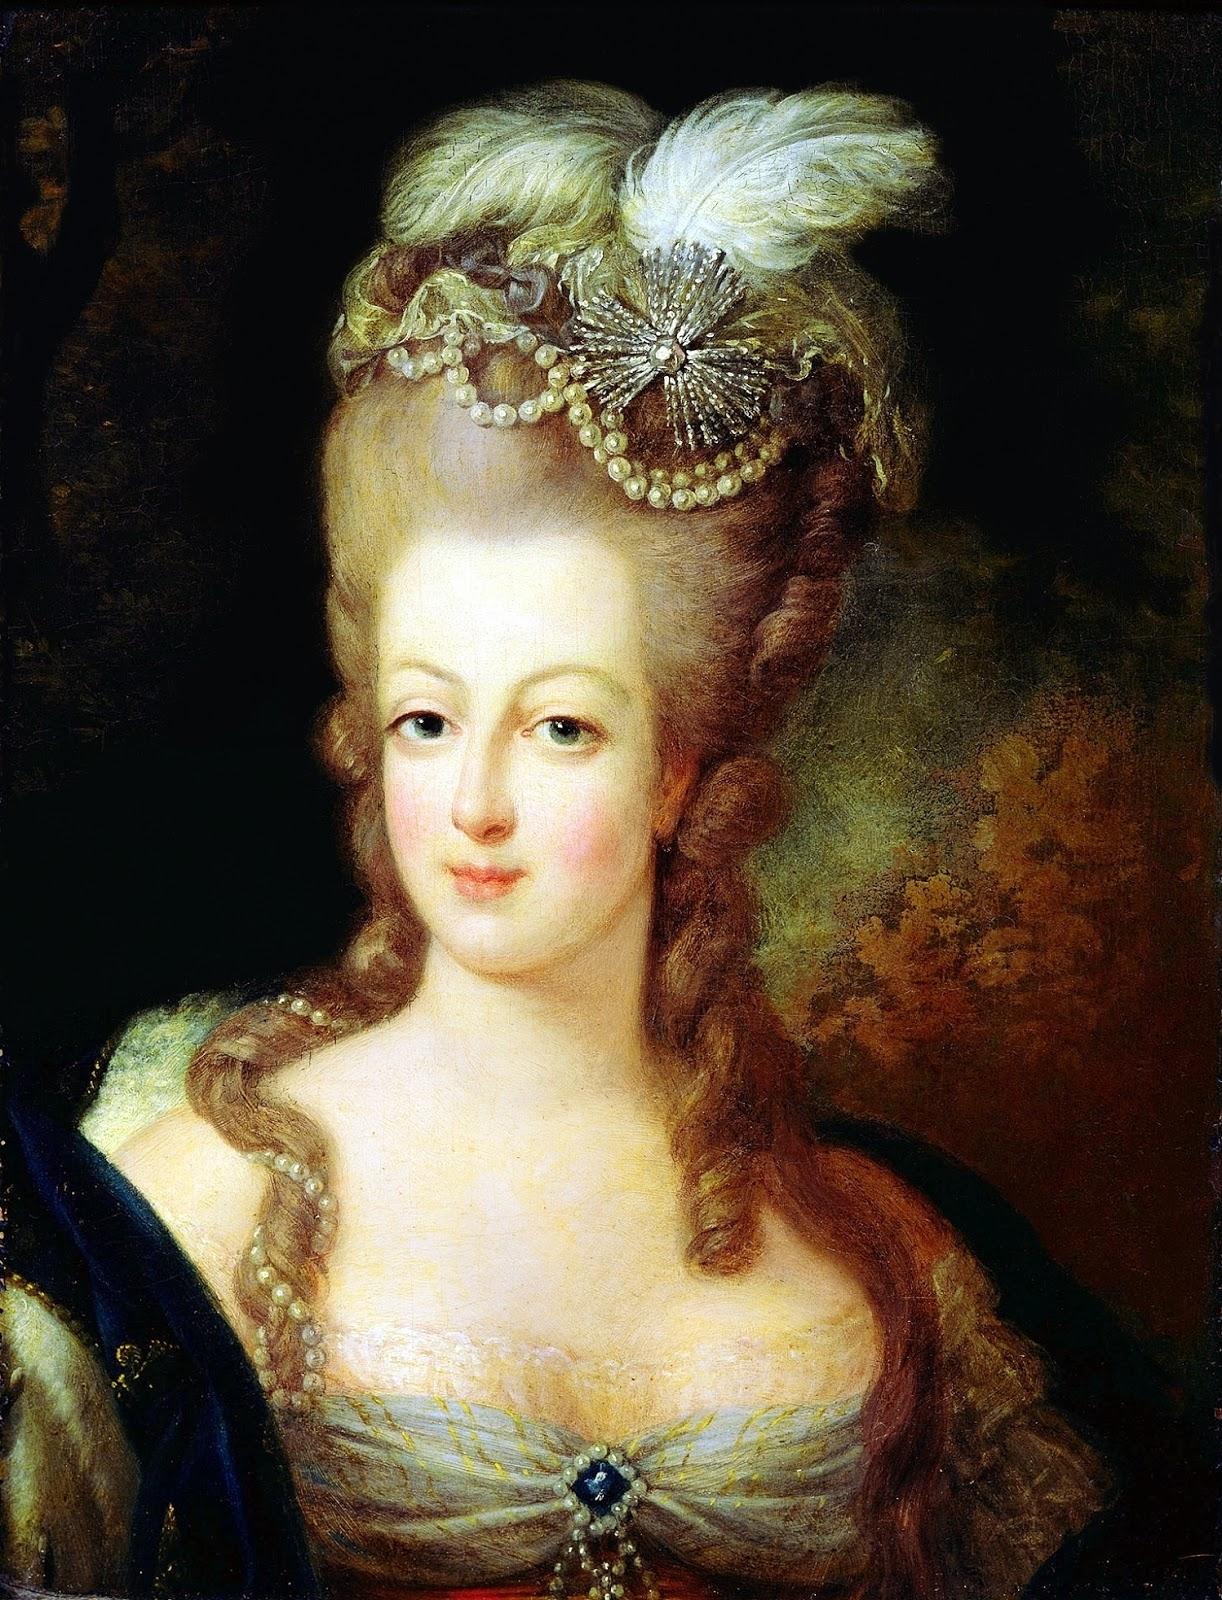 {{Information |Description={{en|1=Portrait of Queen Marie Antoinette of France, 1775.}} |Source=Scan |Author=Jean-Baptiste Gautier Dagoty (1740-1786) |Date=ca. 1775 |Permission= |other_versions=http://commons.wikimedia.org/wiki/File:Marie-Antoinette,_1775